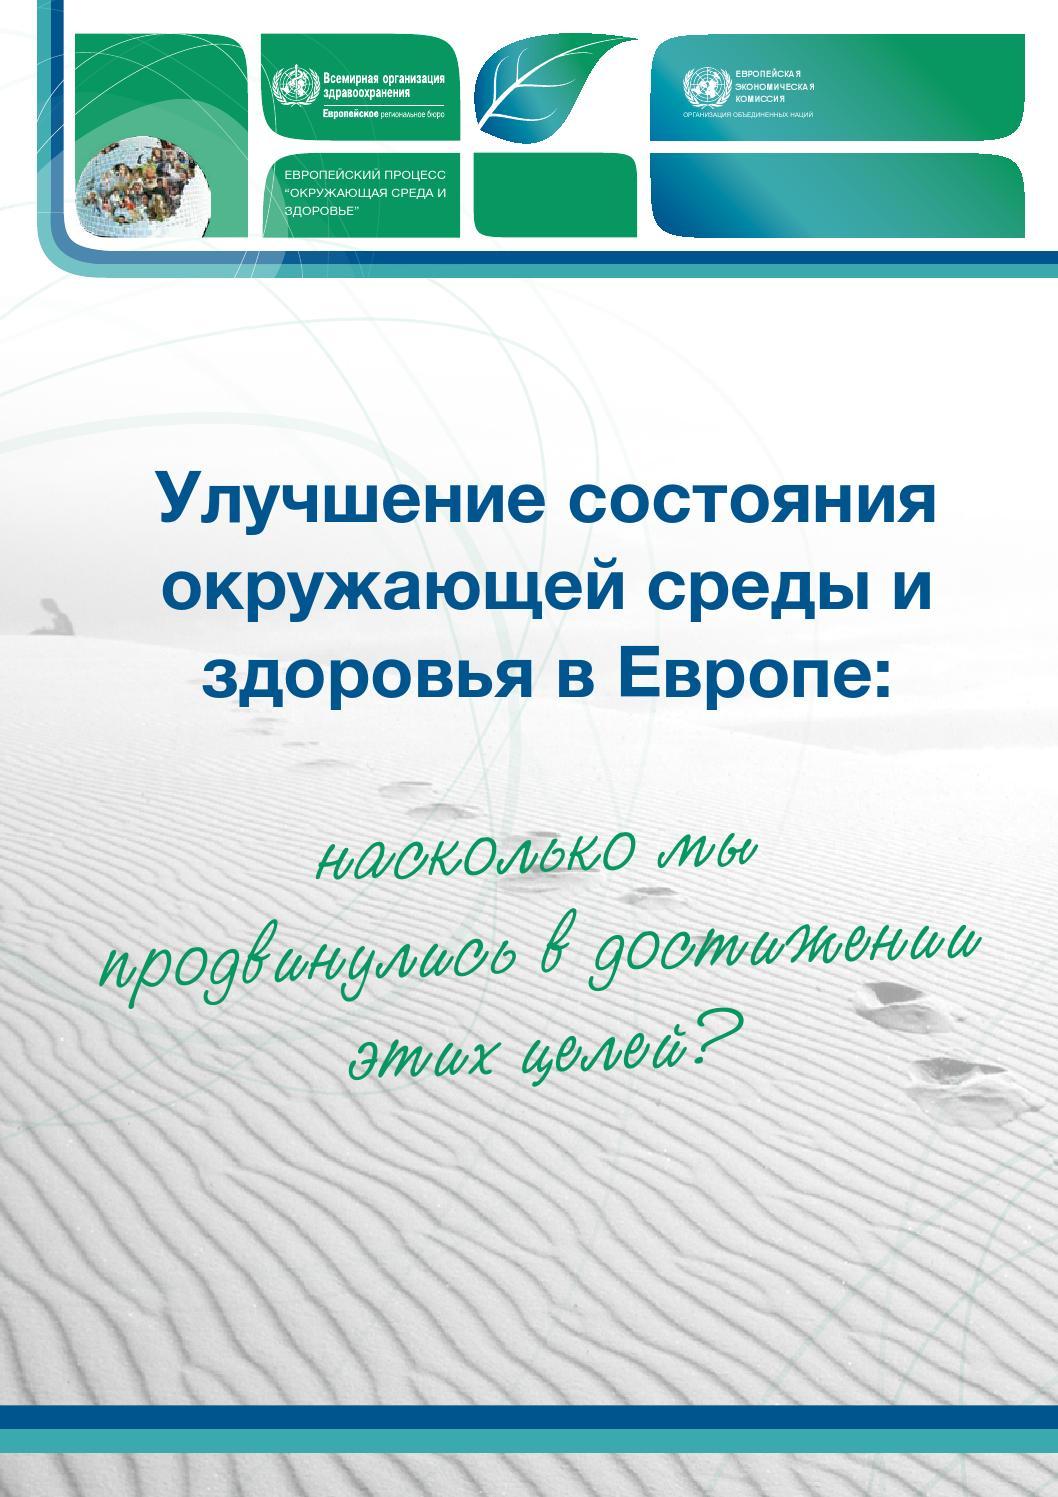 Improving environment health europe ru by World Health Organization  Regional Office for Europe - issuu c4e5d22baf4